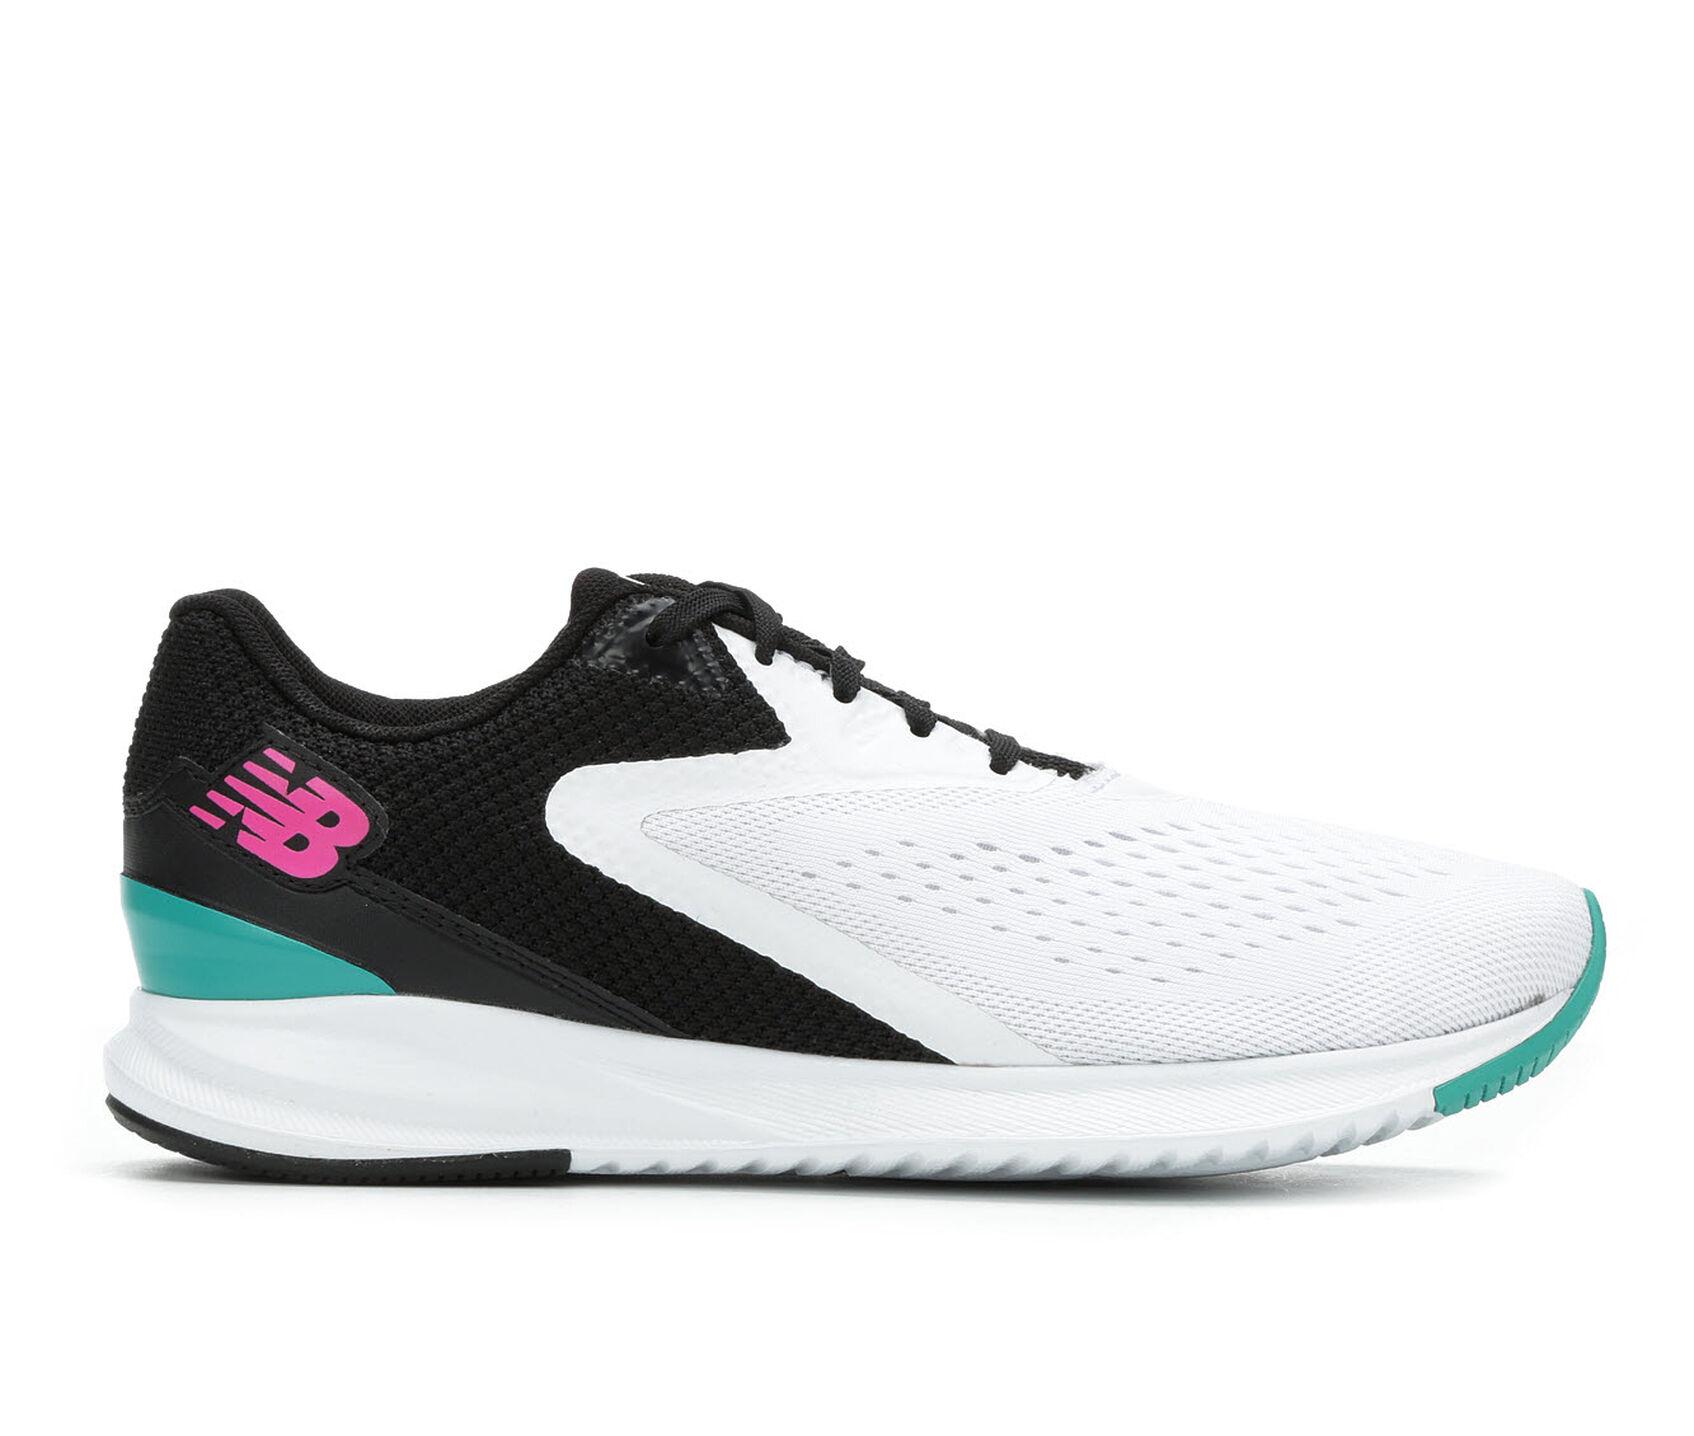 cheap price 50% off ever popular Women's New Balance Vizo Pro Run Running Shoes